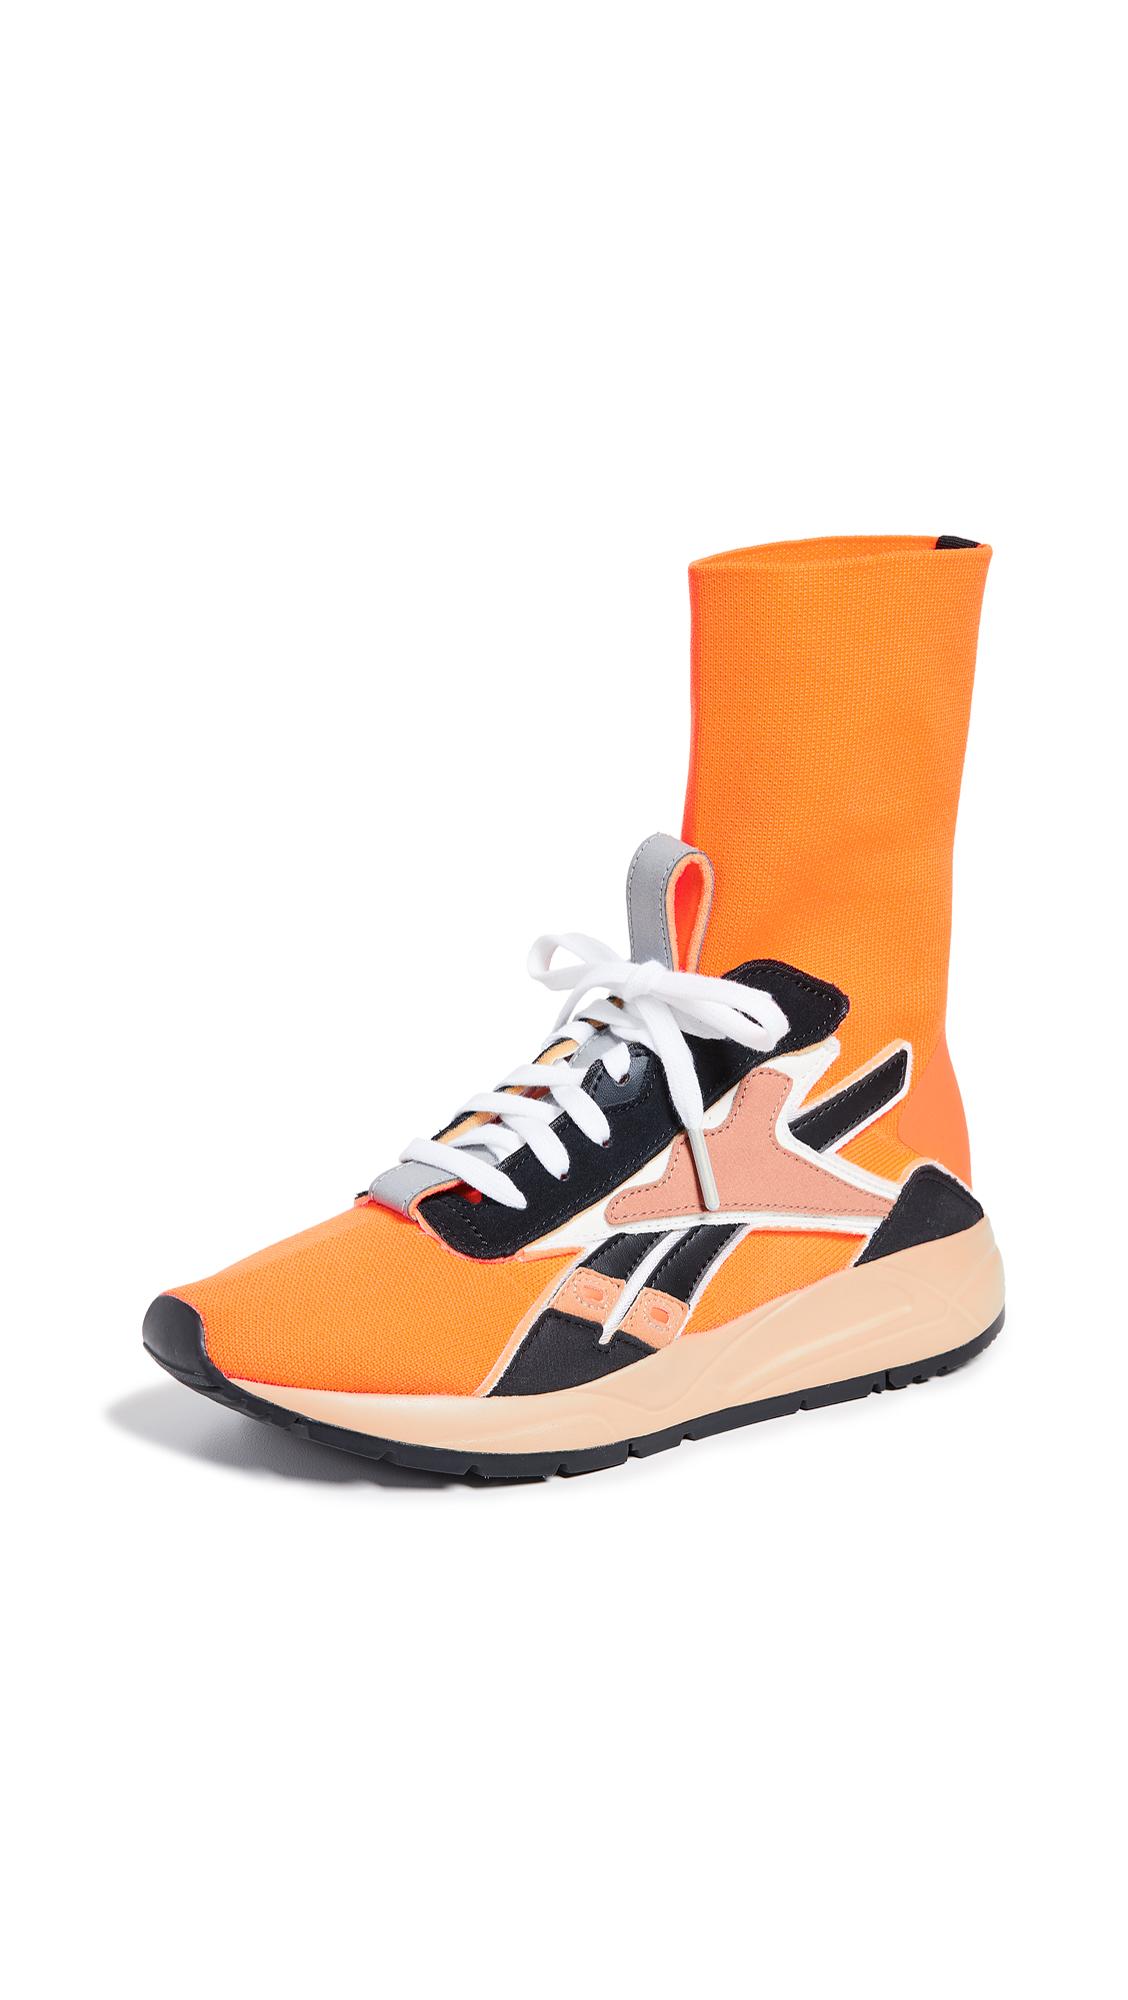 Reebok x Victoria Beckham VB Bolton Sock Sneakers - Solar Orange/Soft Camel/Black